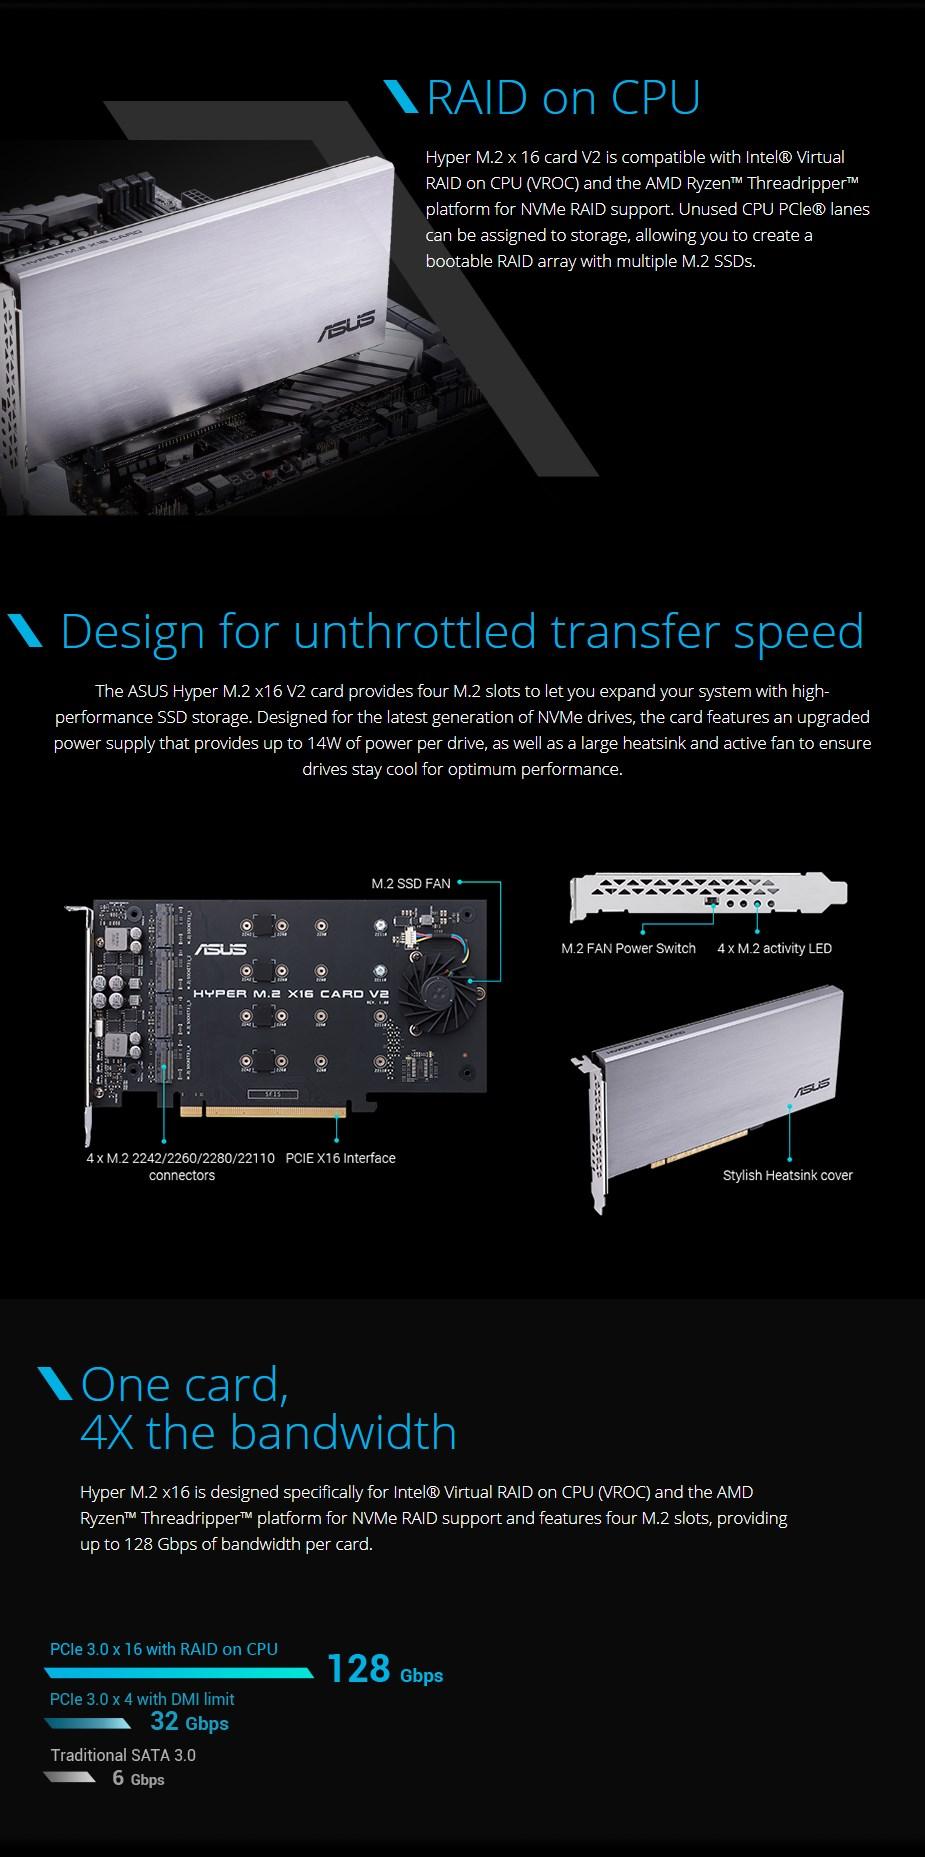 ASUS HYPER M.2 X16 CARD V2 Raid Card - Overview 1